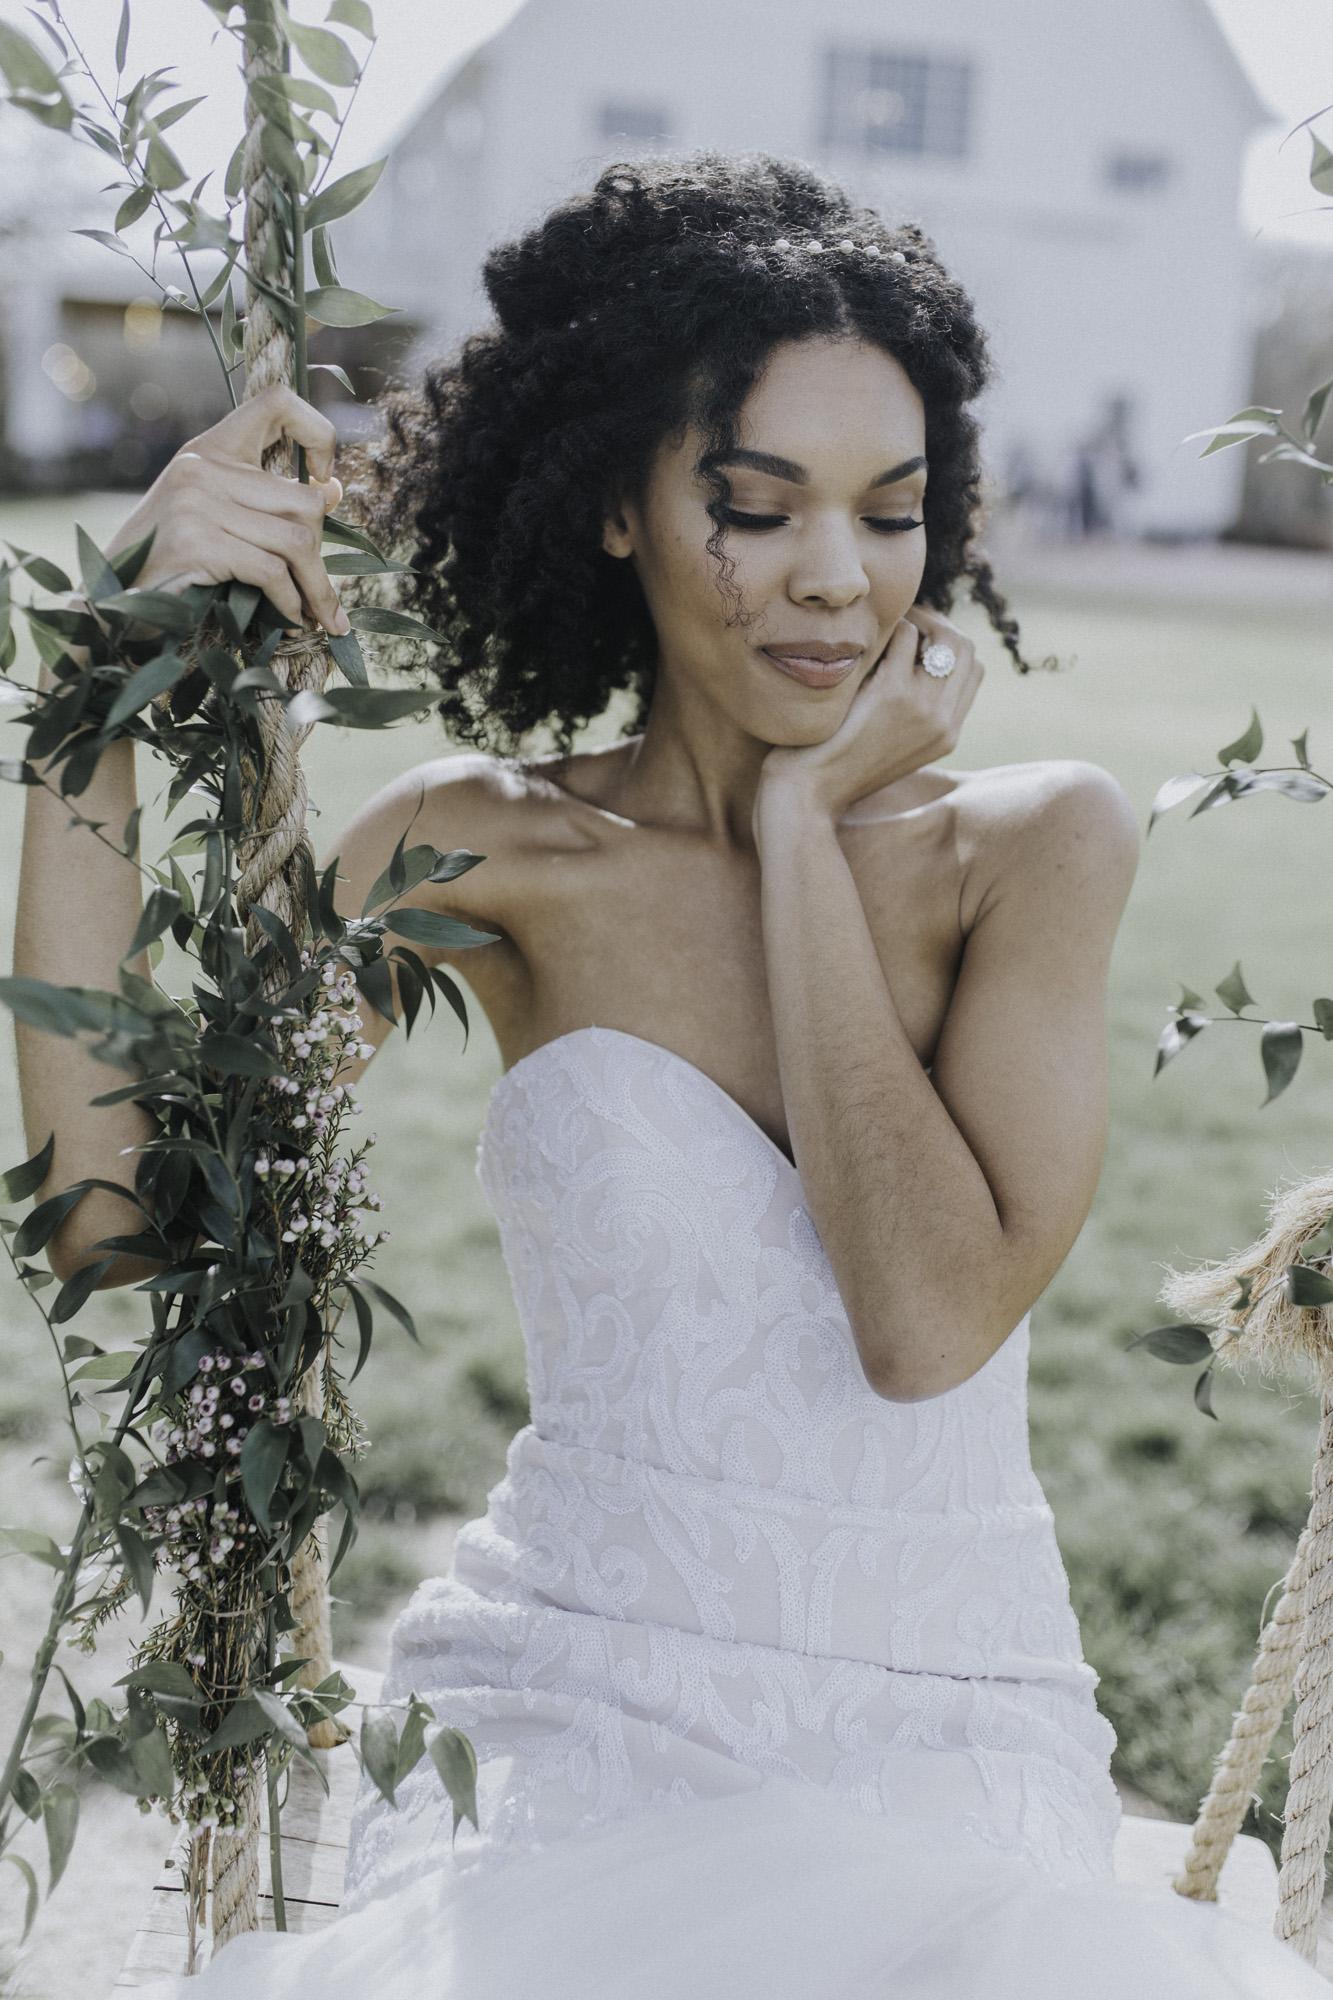 Cate_Ann_Photography_Dayton_Ohio_Wedding_Elopement_And_Engagement_PhotographerIMG_8262-2.jpg